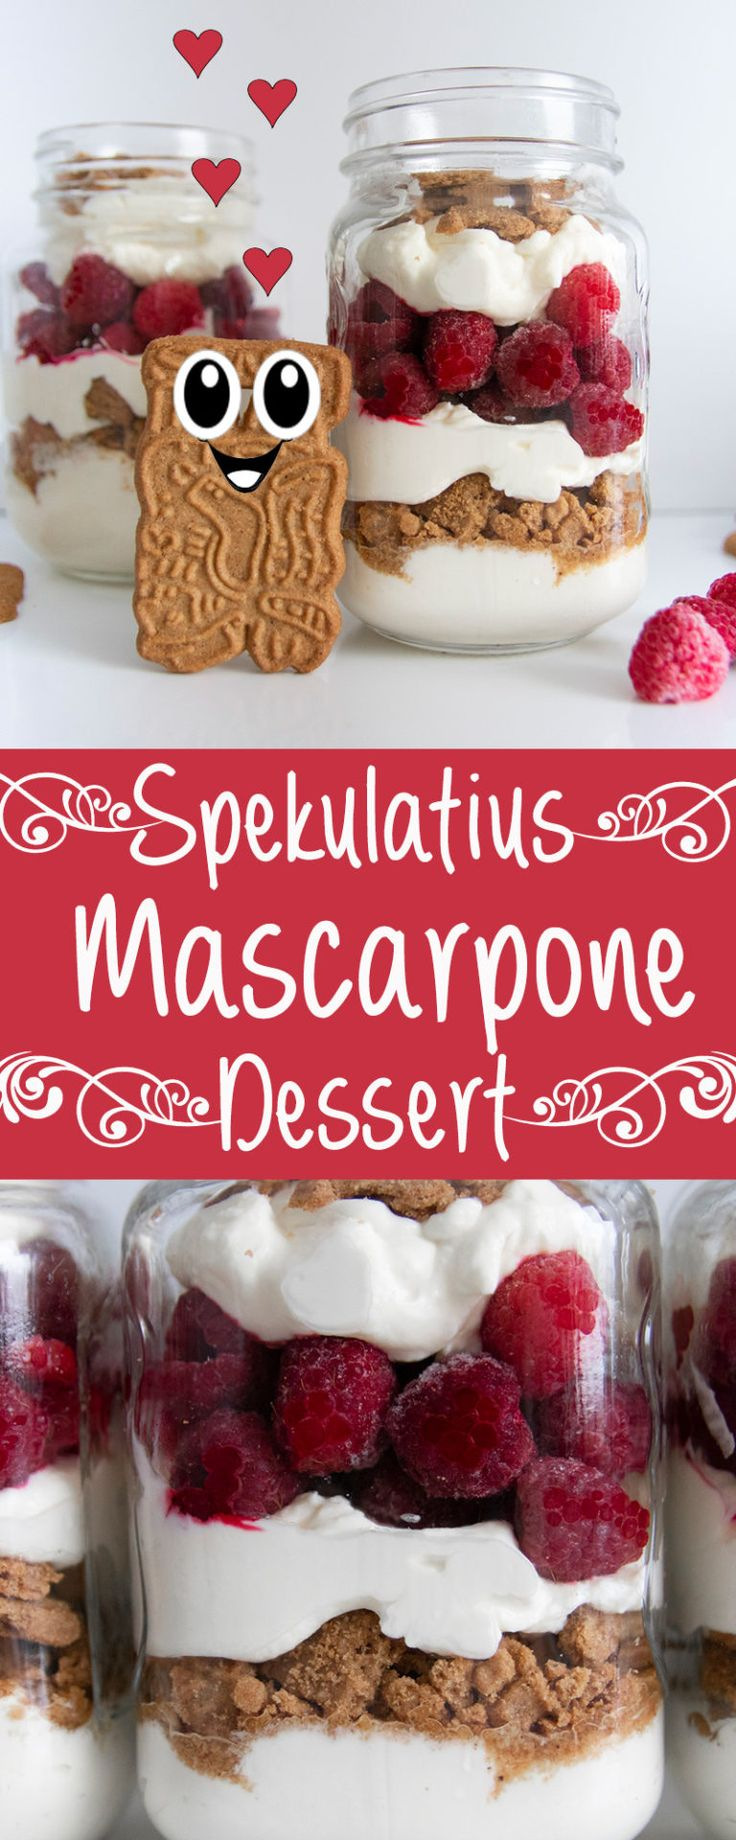 WOW! 5 Minuten Spekulatius Mascarpone Dessert   Mascarpone ...